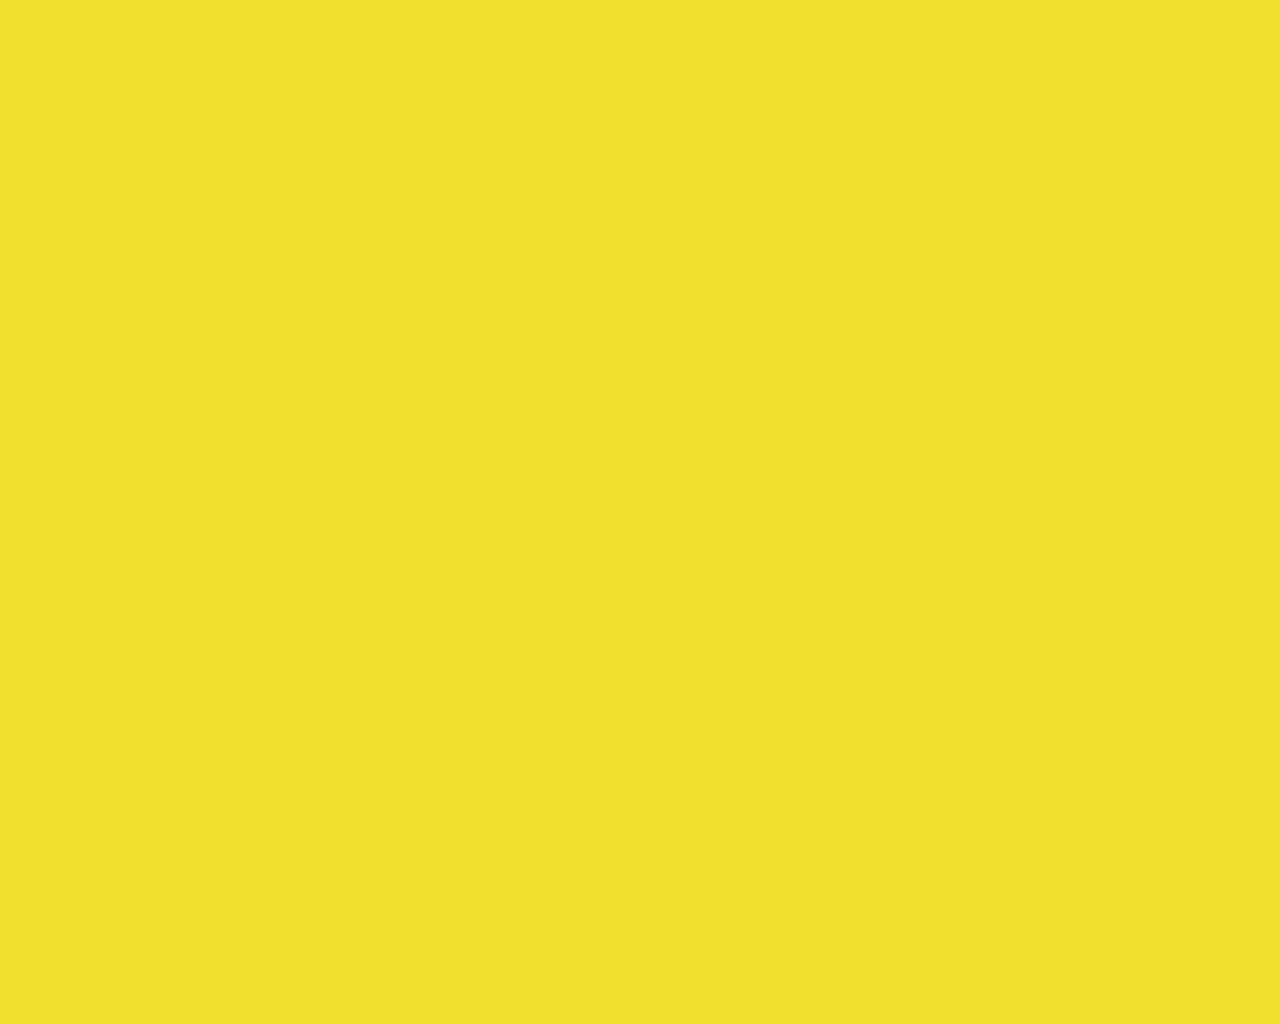 1280x1024 Dandelion Solid Color Background